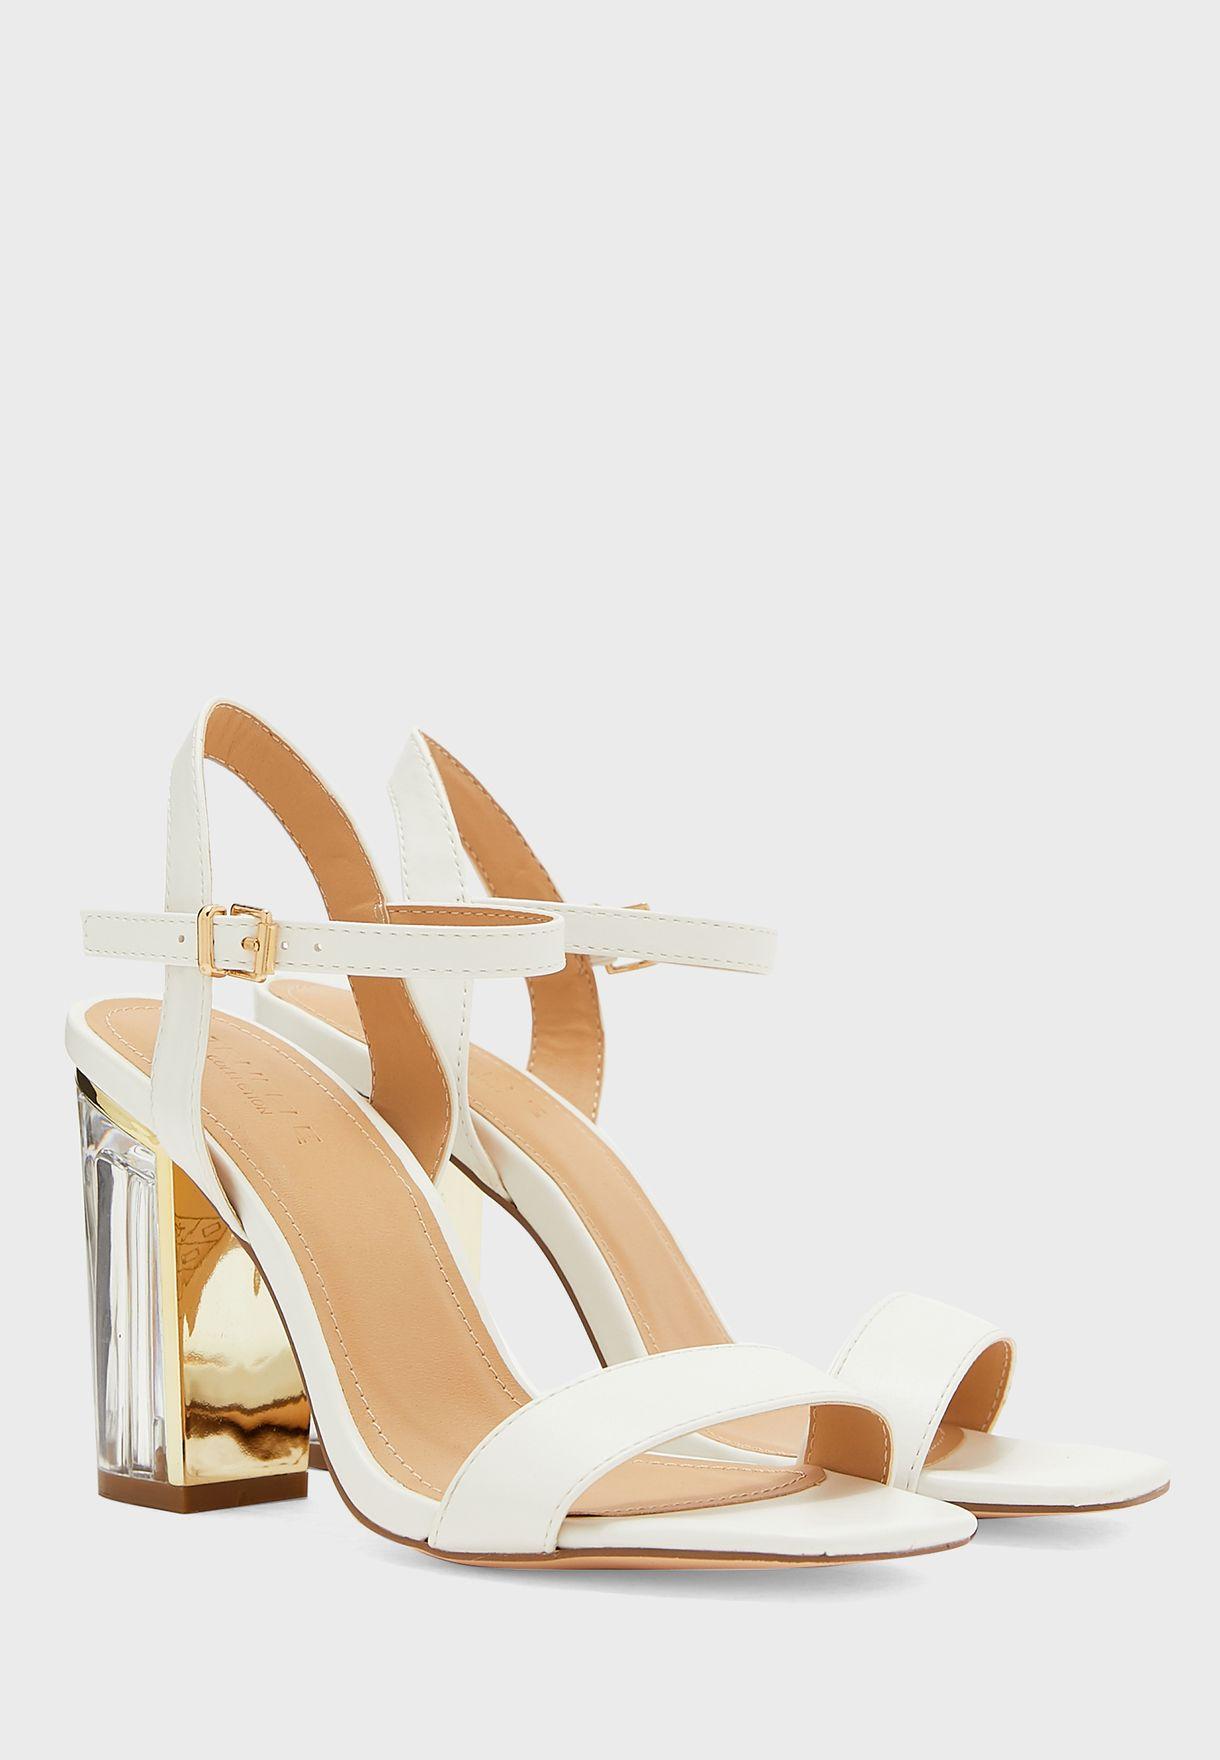 Ankle Strap Sandal With Persplex Heel